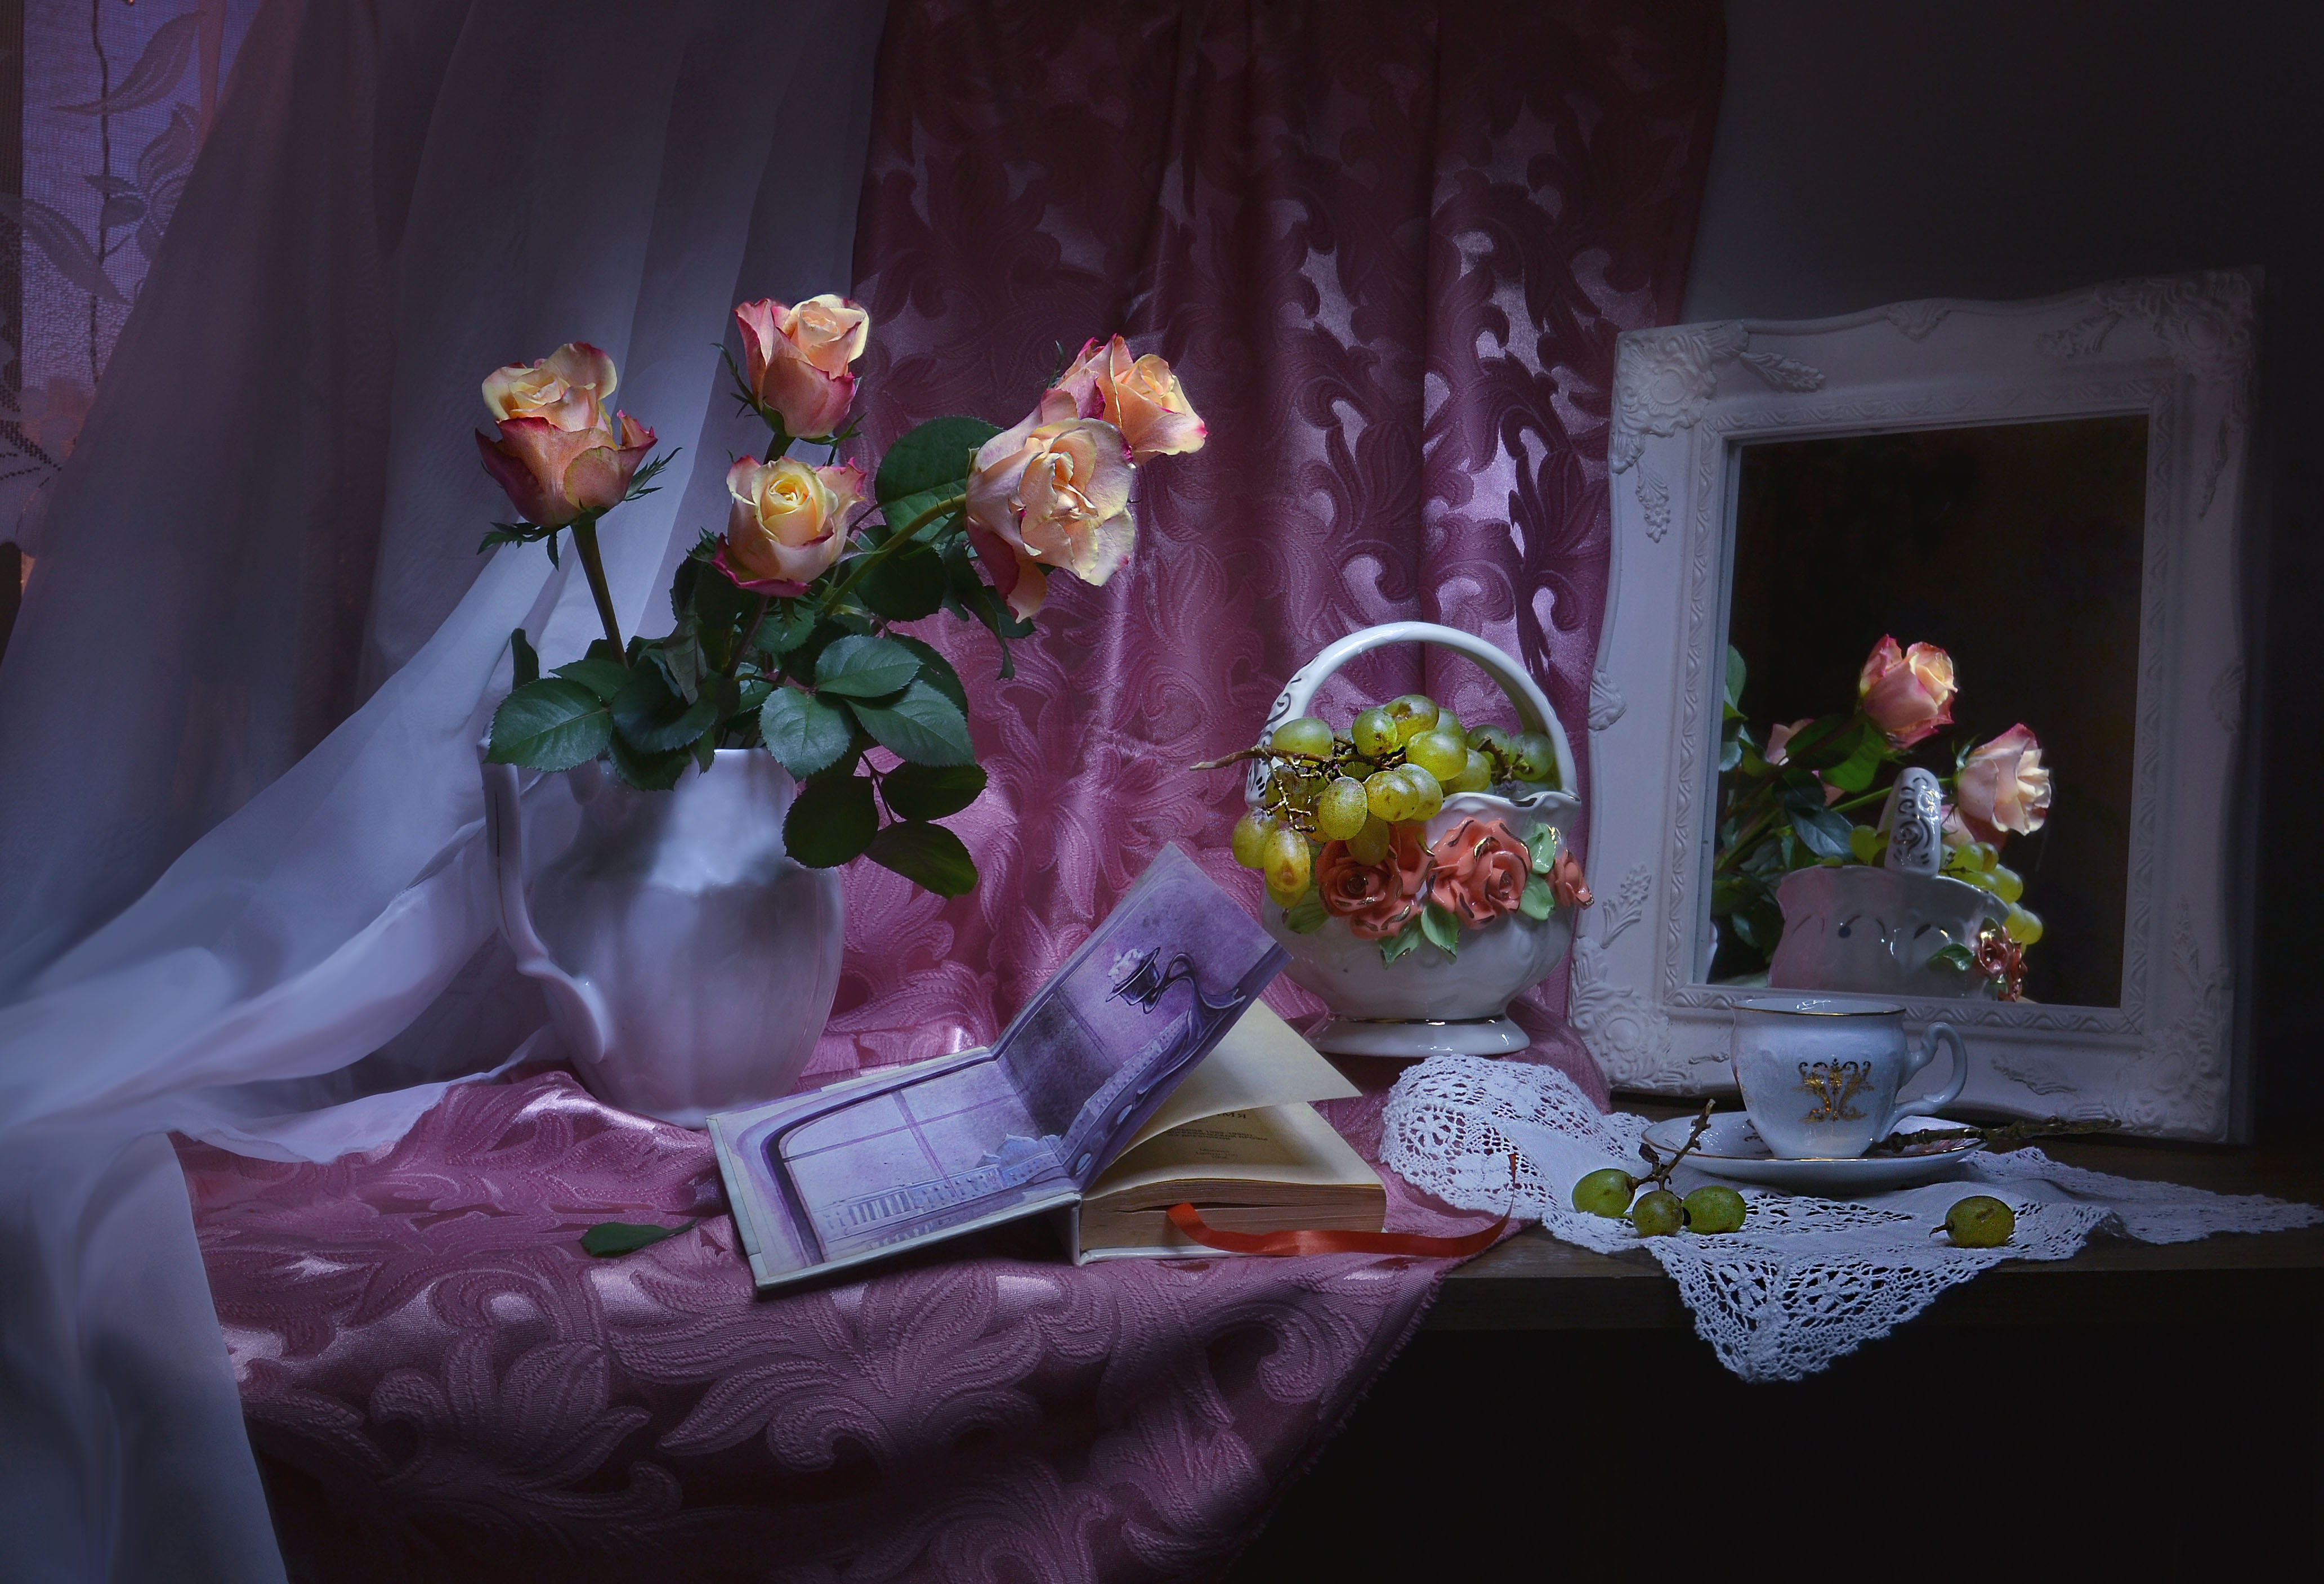 still life, натюрморт, весна, виноград, за полночь, зеркало, книга, март, отражение, розы, фарфор, фото натюрморт, цвет, Колова Валентина